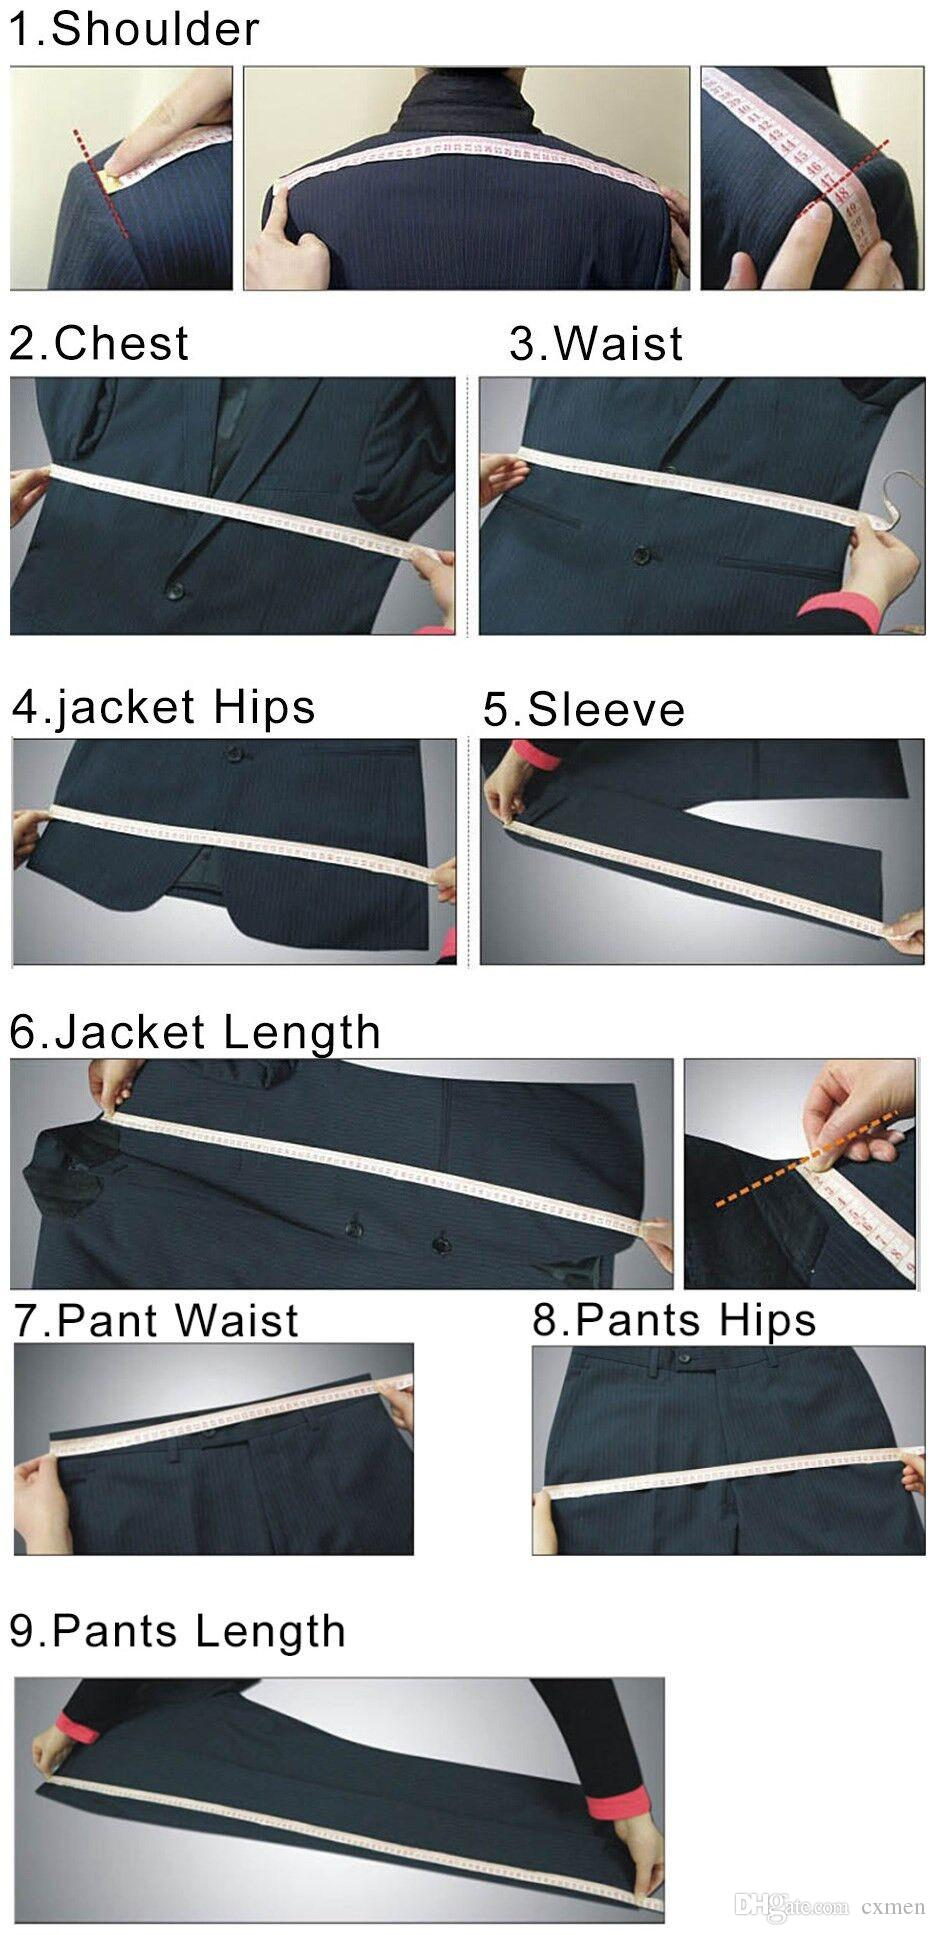 Velvet Shawl Lapel Handsome Black Men Suits Wedding Slim Fit Tuxedos Groom Jacket+Pants Best Men Suits Prom